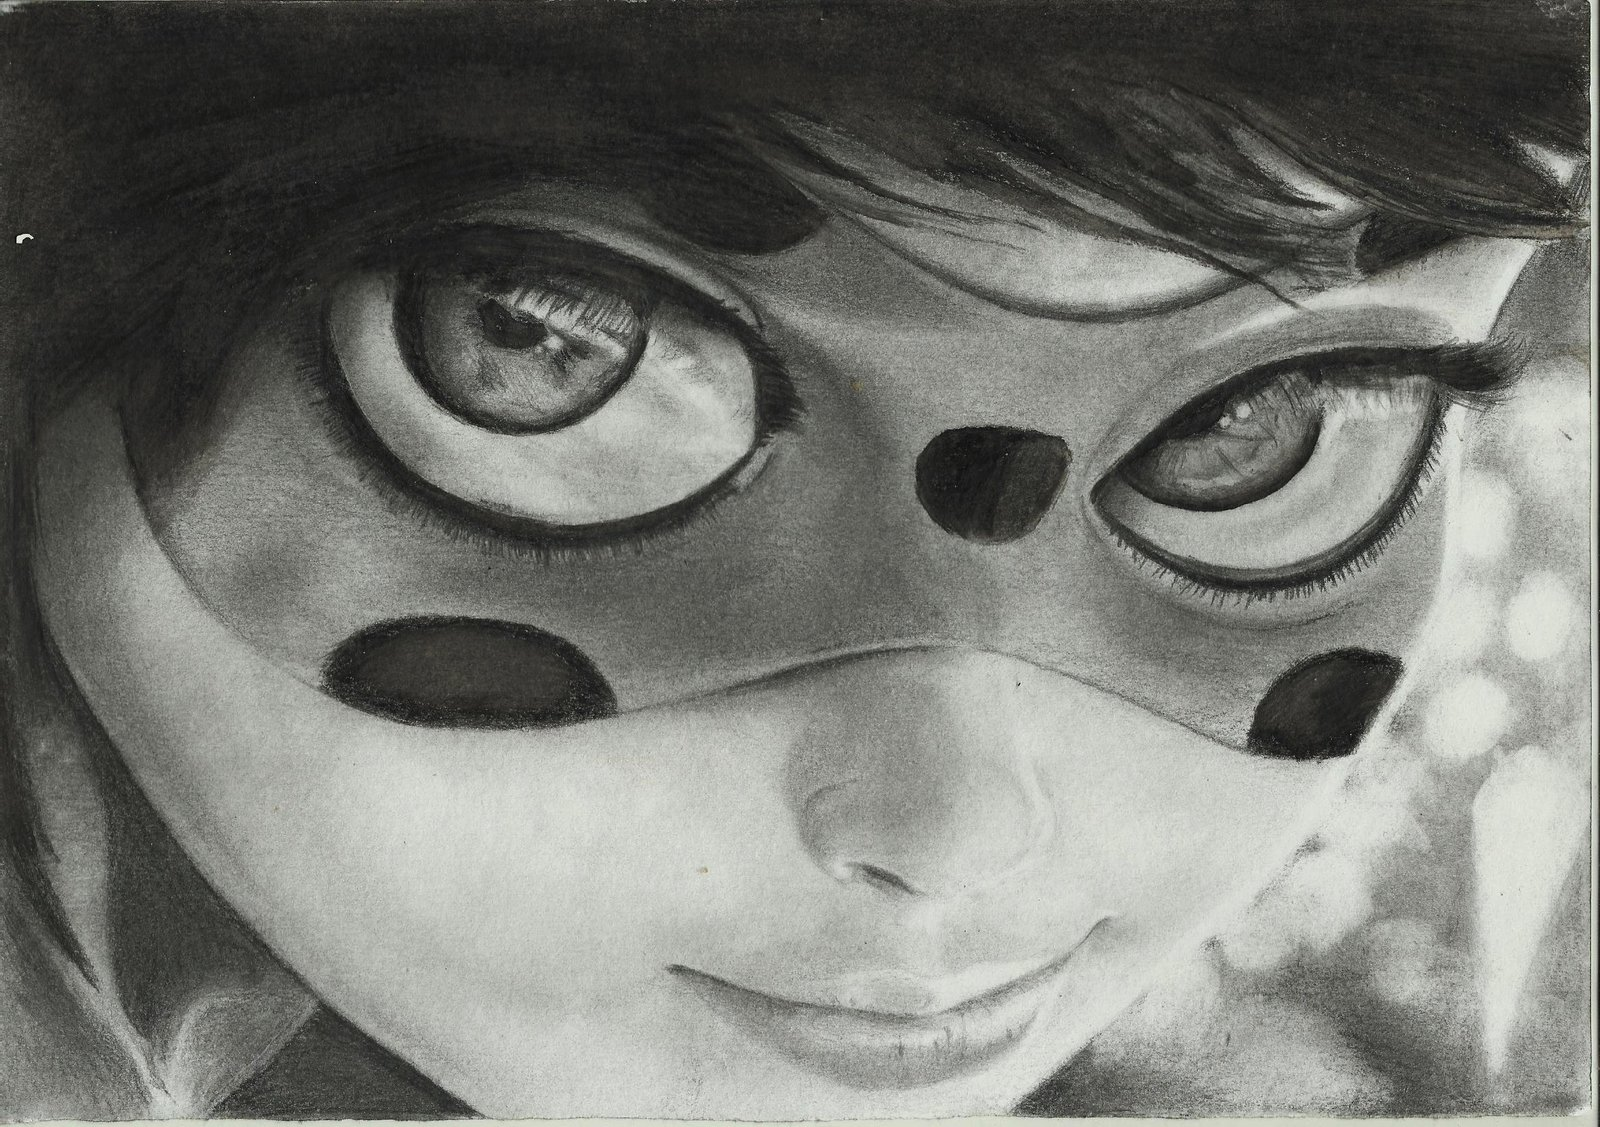 Картинки леди баг и супер кота для срисовки карандашом